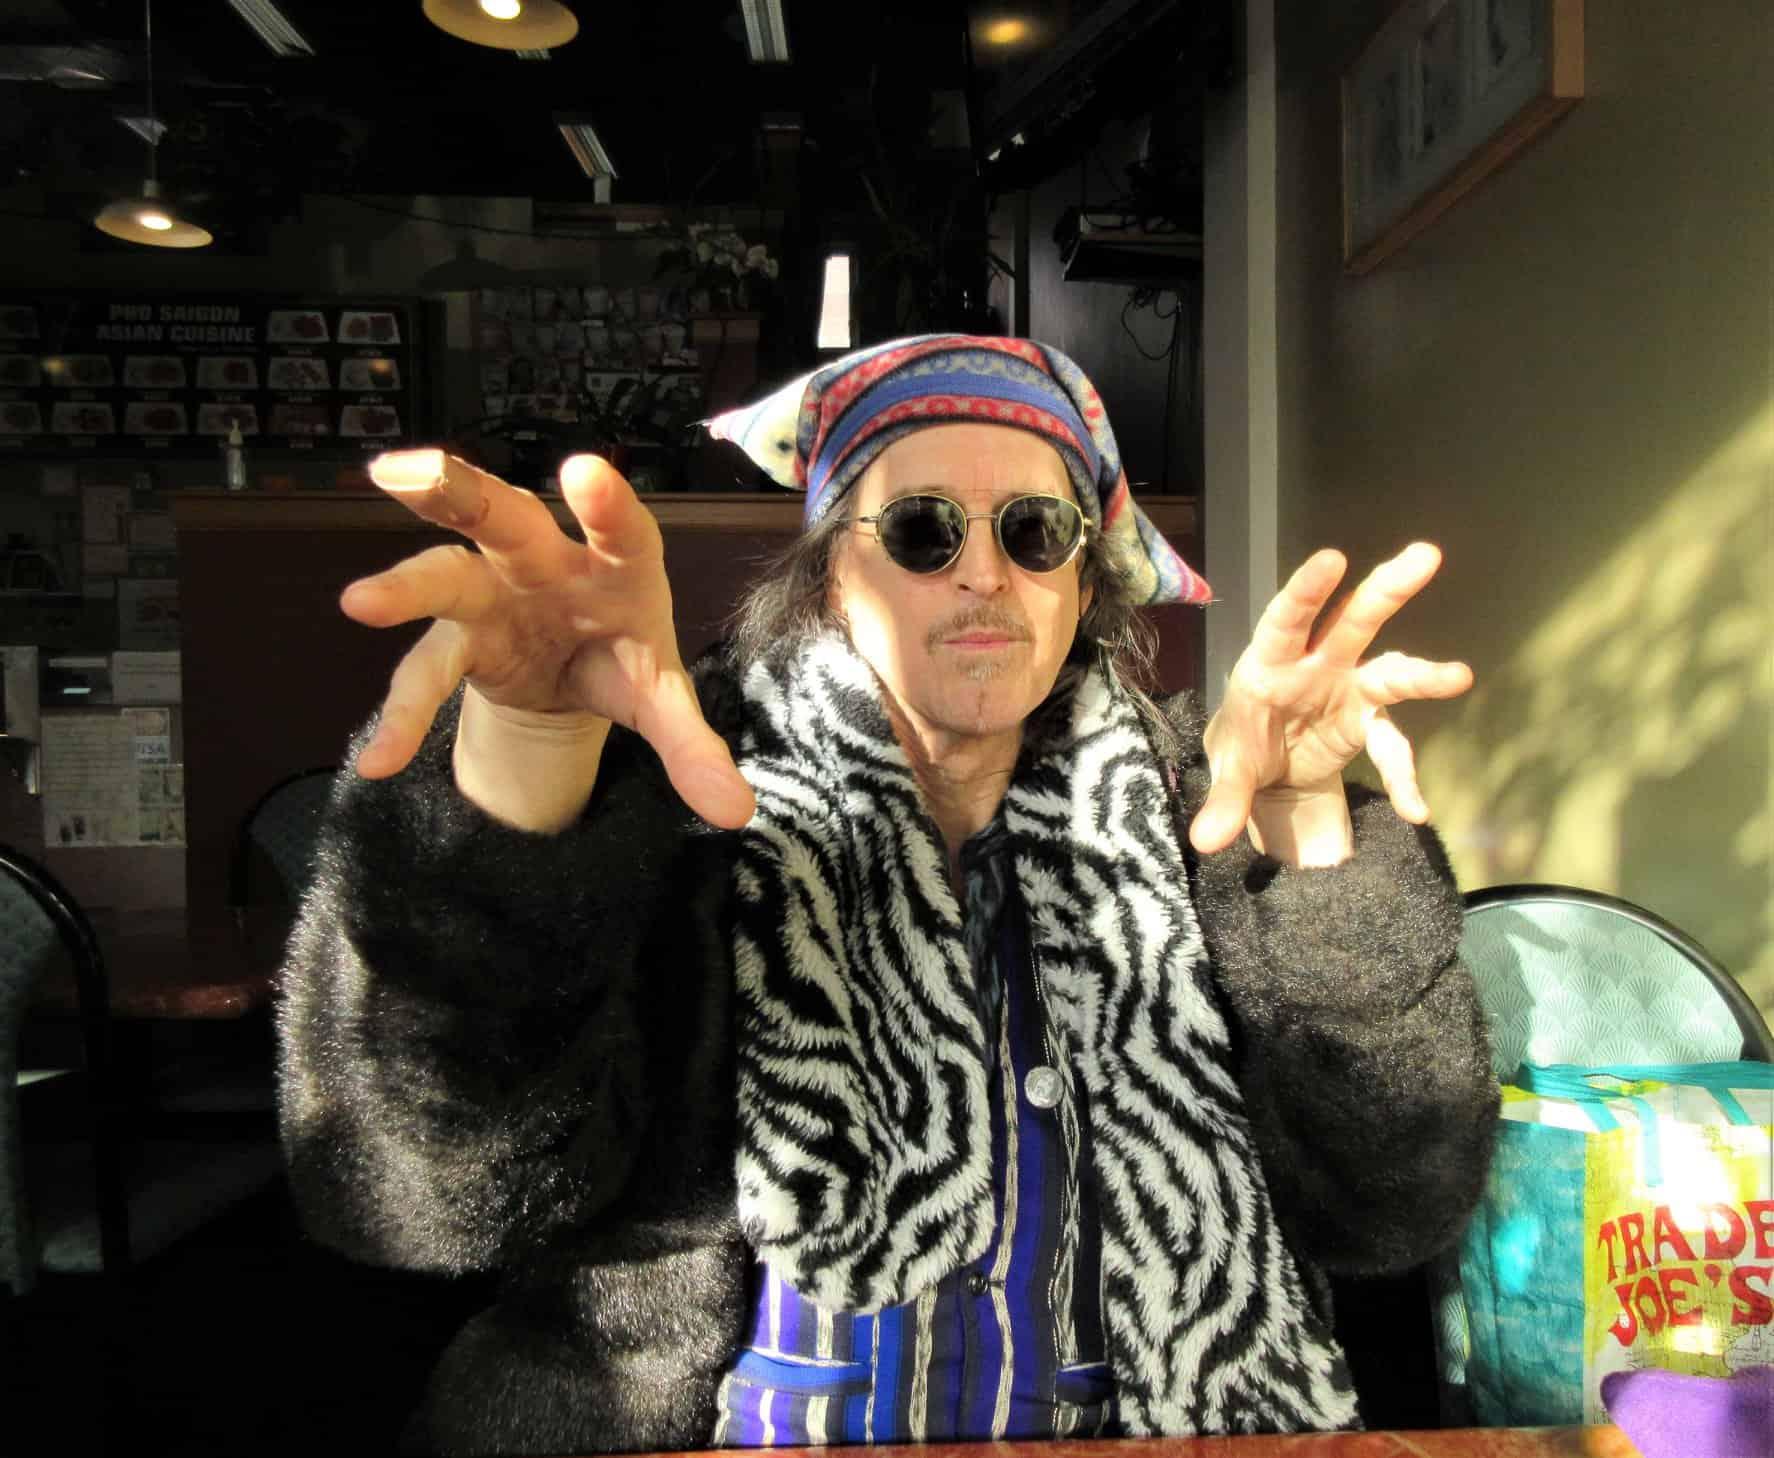 Jon Strongbow magic hands